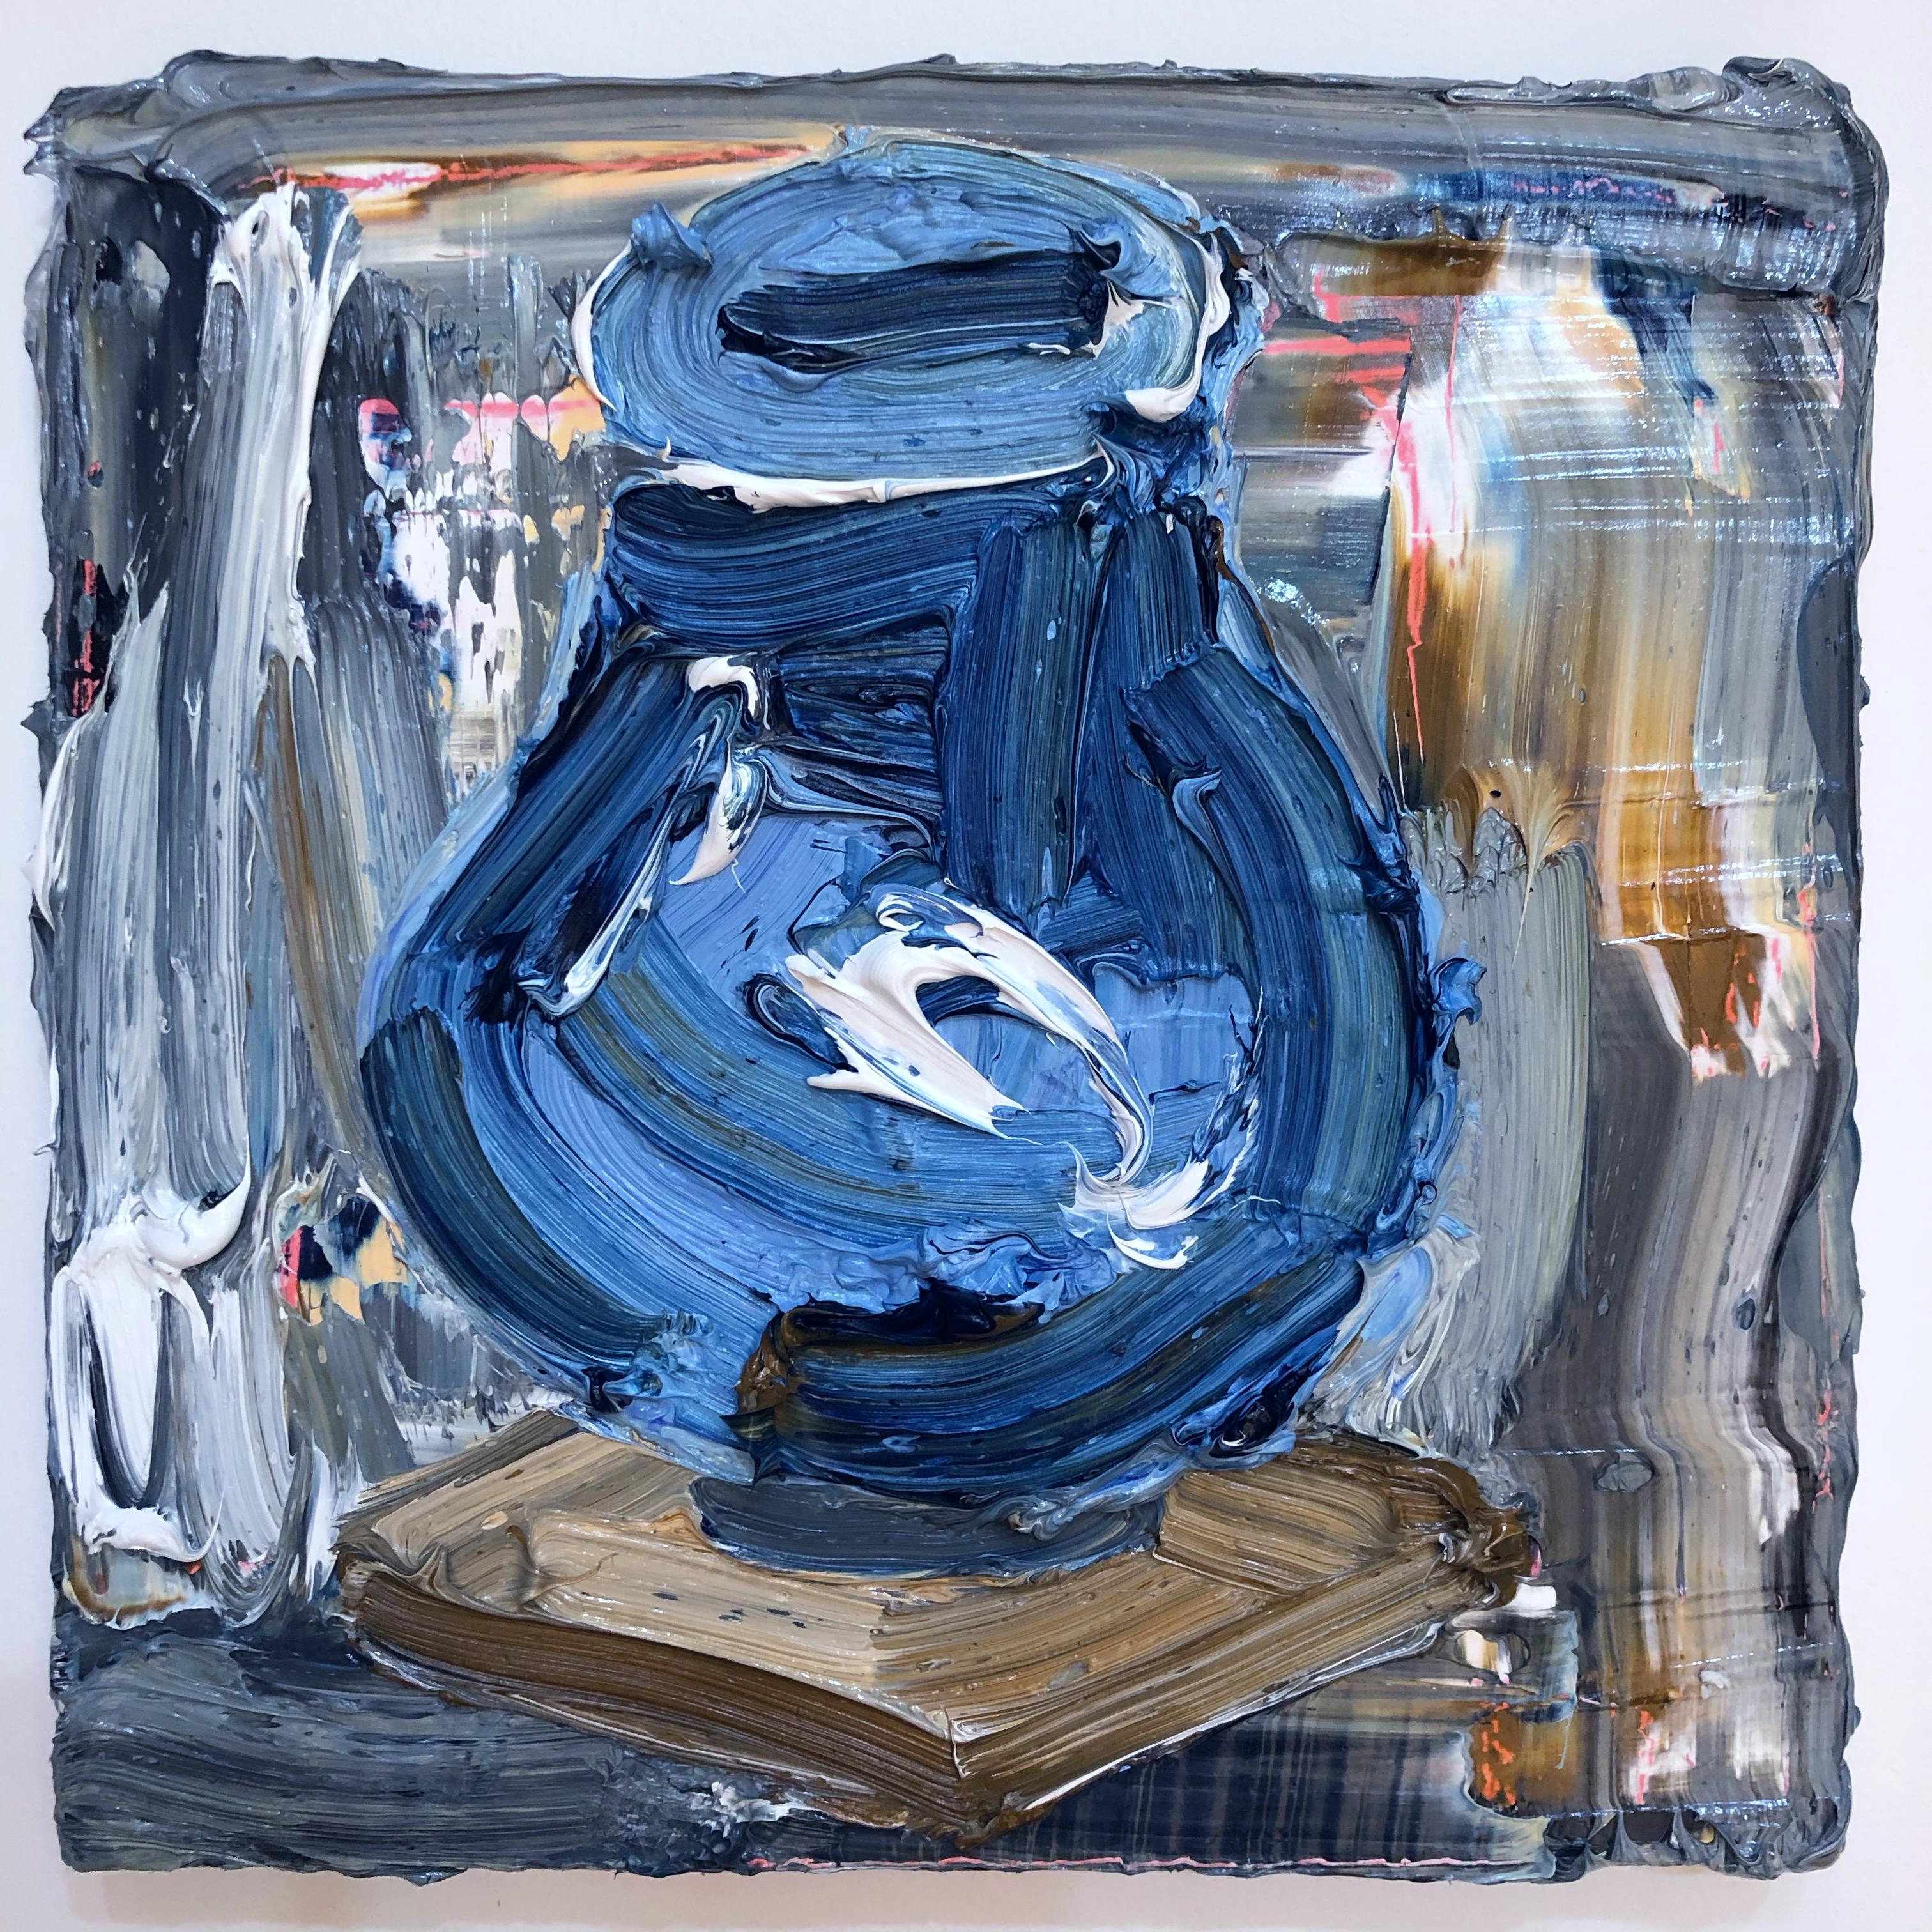 carp vase 30x30cm 2021